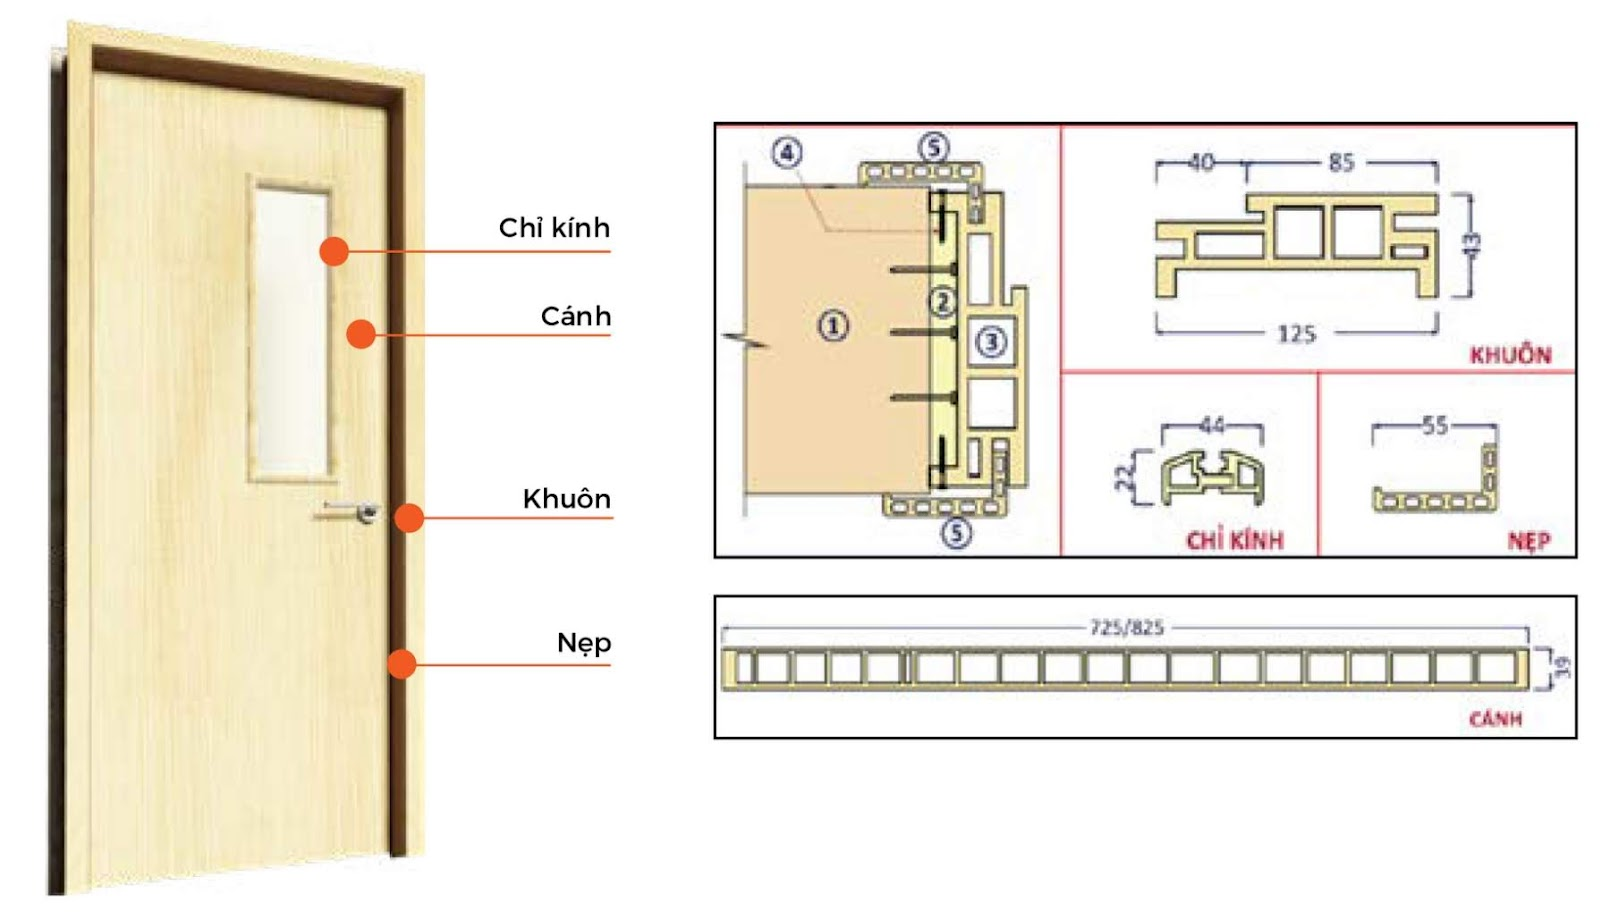 Mặt cắt chi tiết cấu tạo sản phẩm cửa gỗ Composite Eurowindow